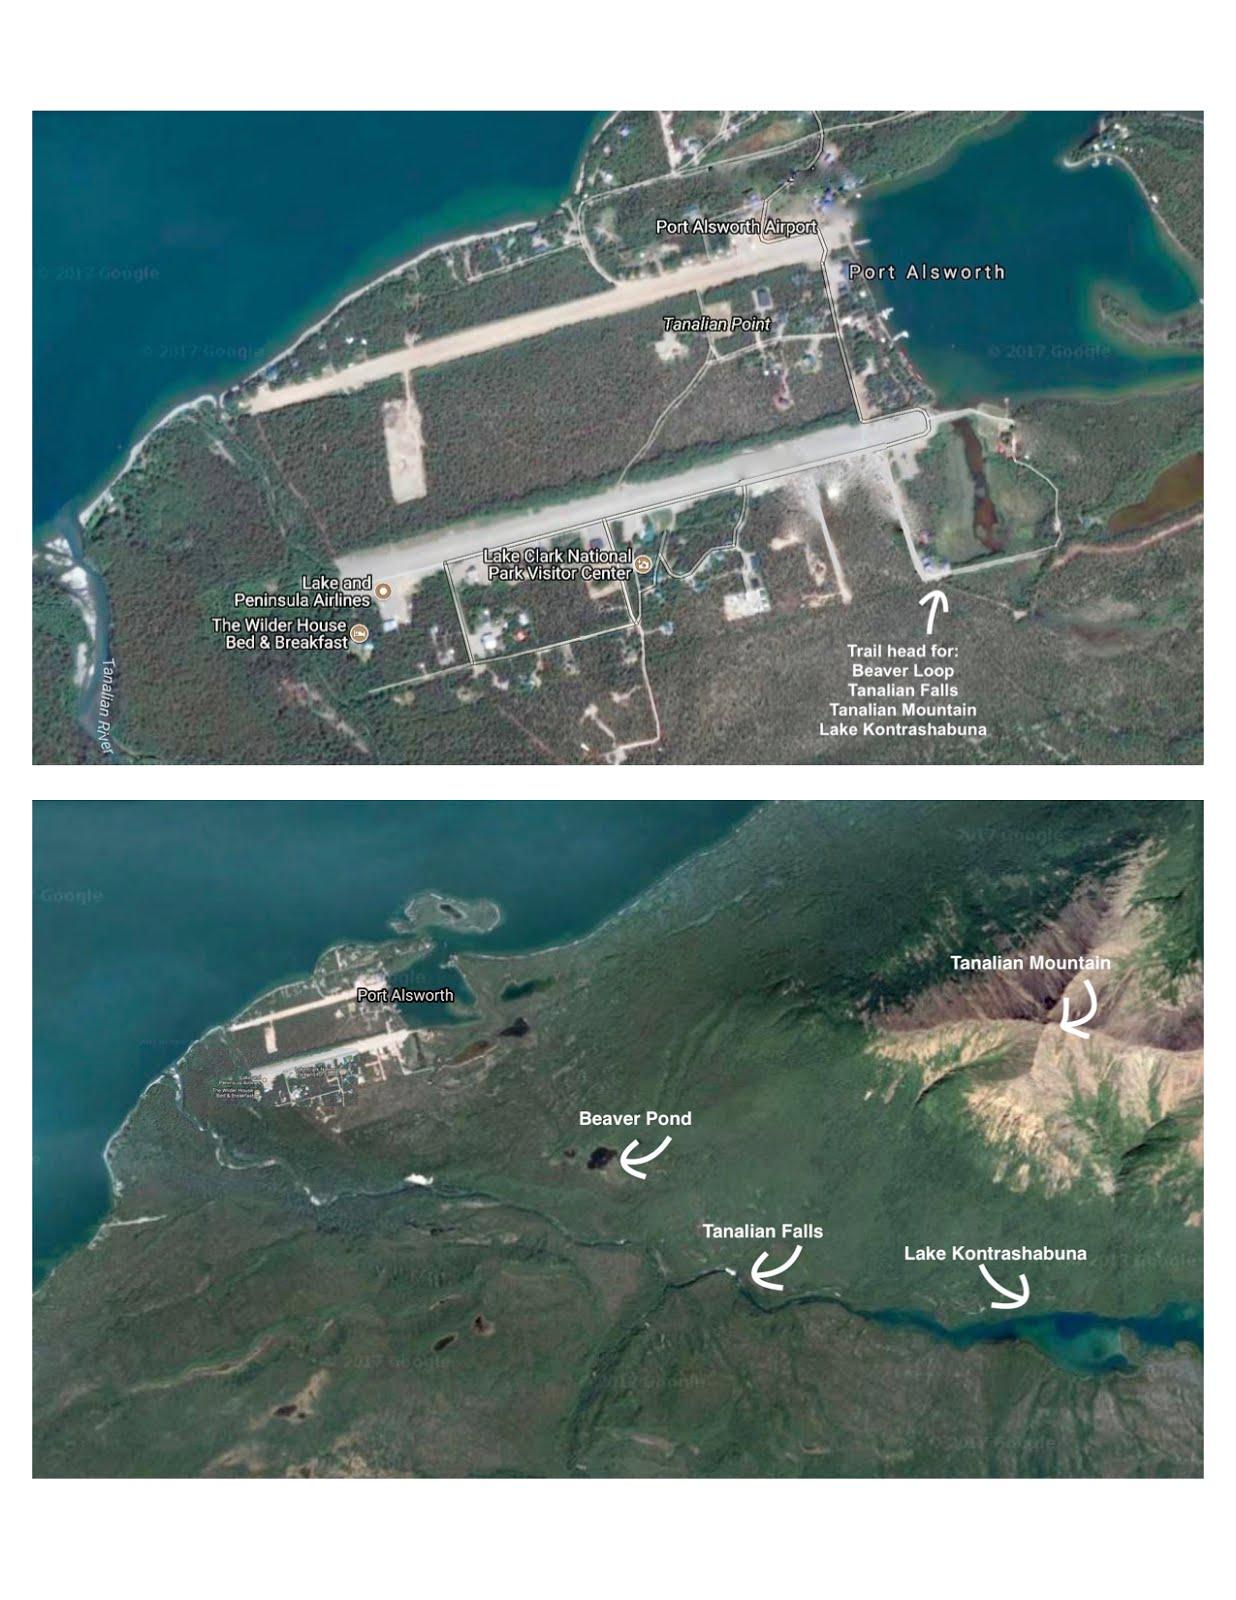 Port Alsworth Alaska Map.Lake And Pen Air Unlocking Alaska Port Alsworth To Do List Maps